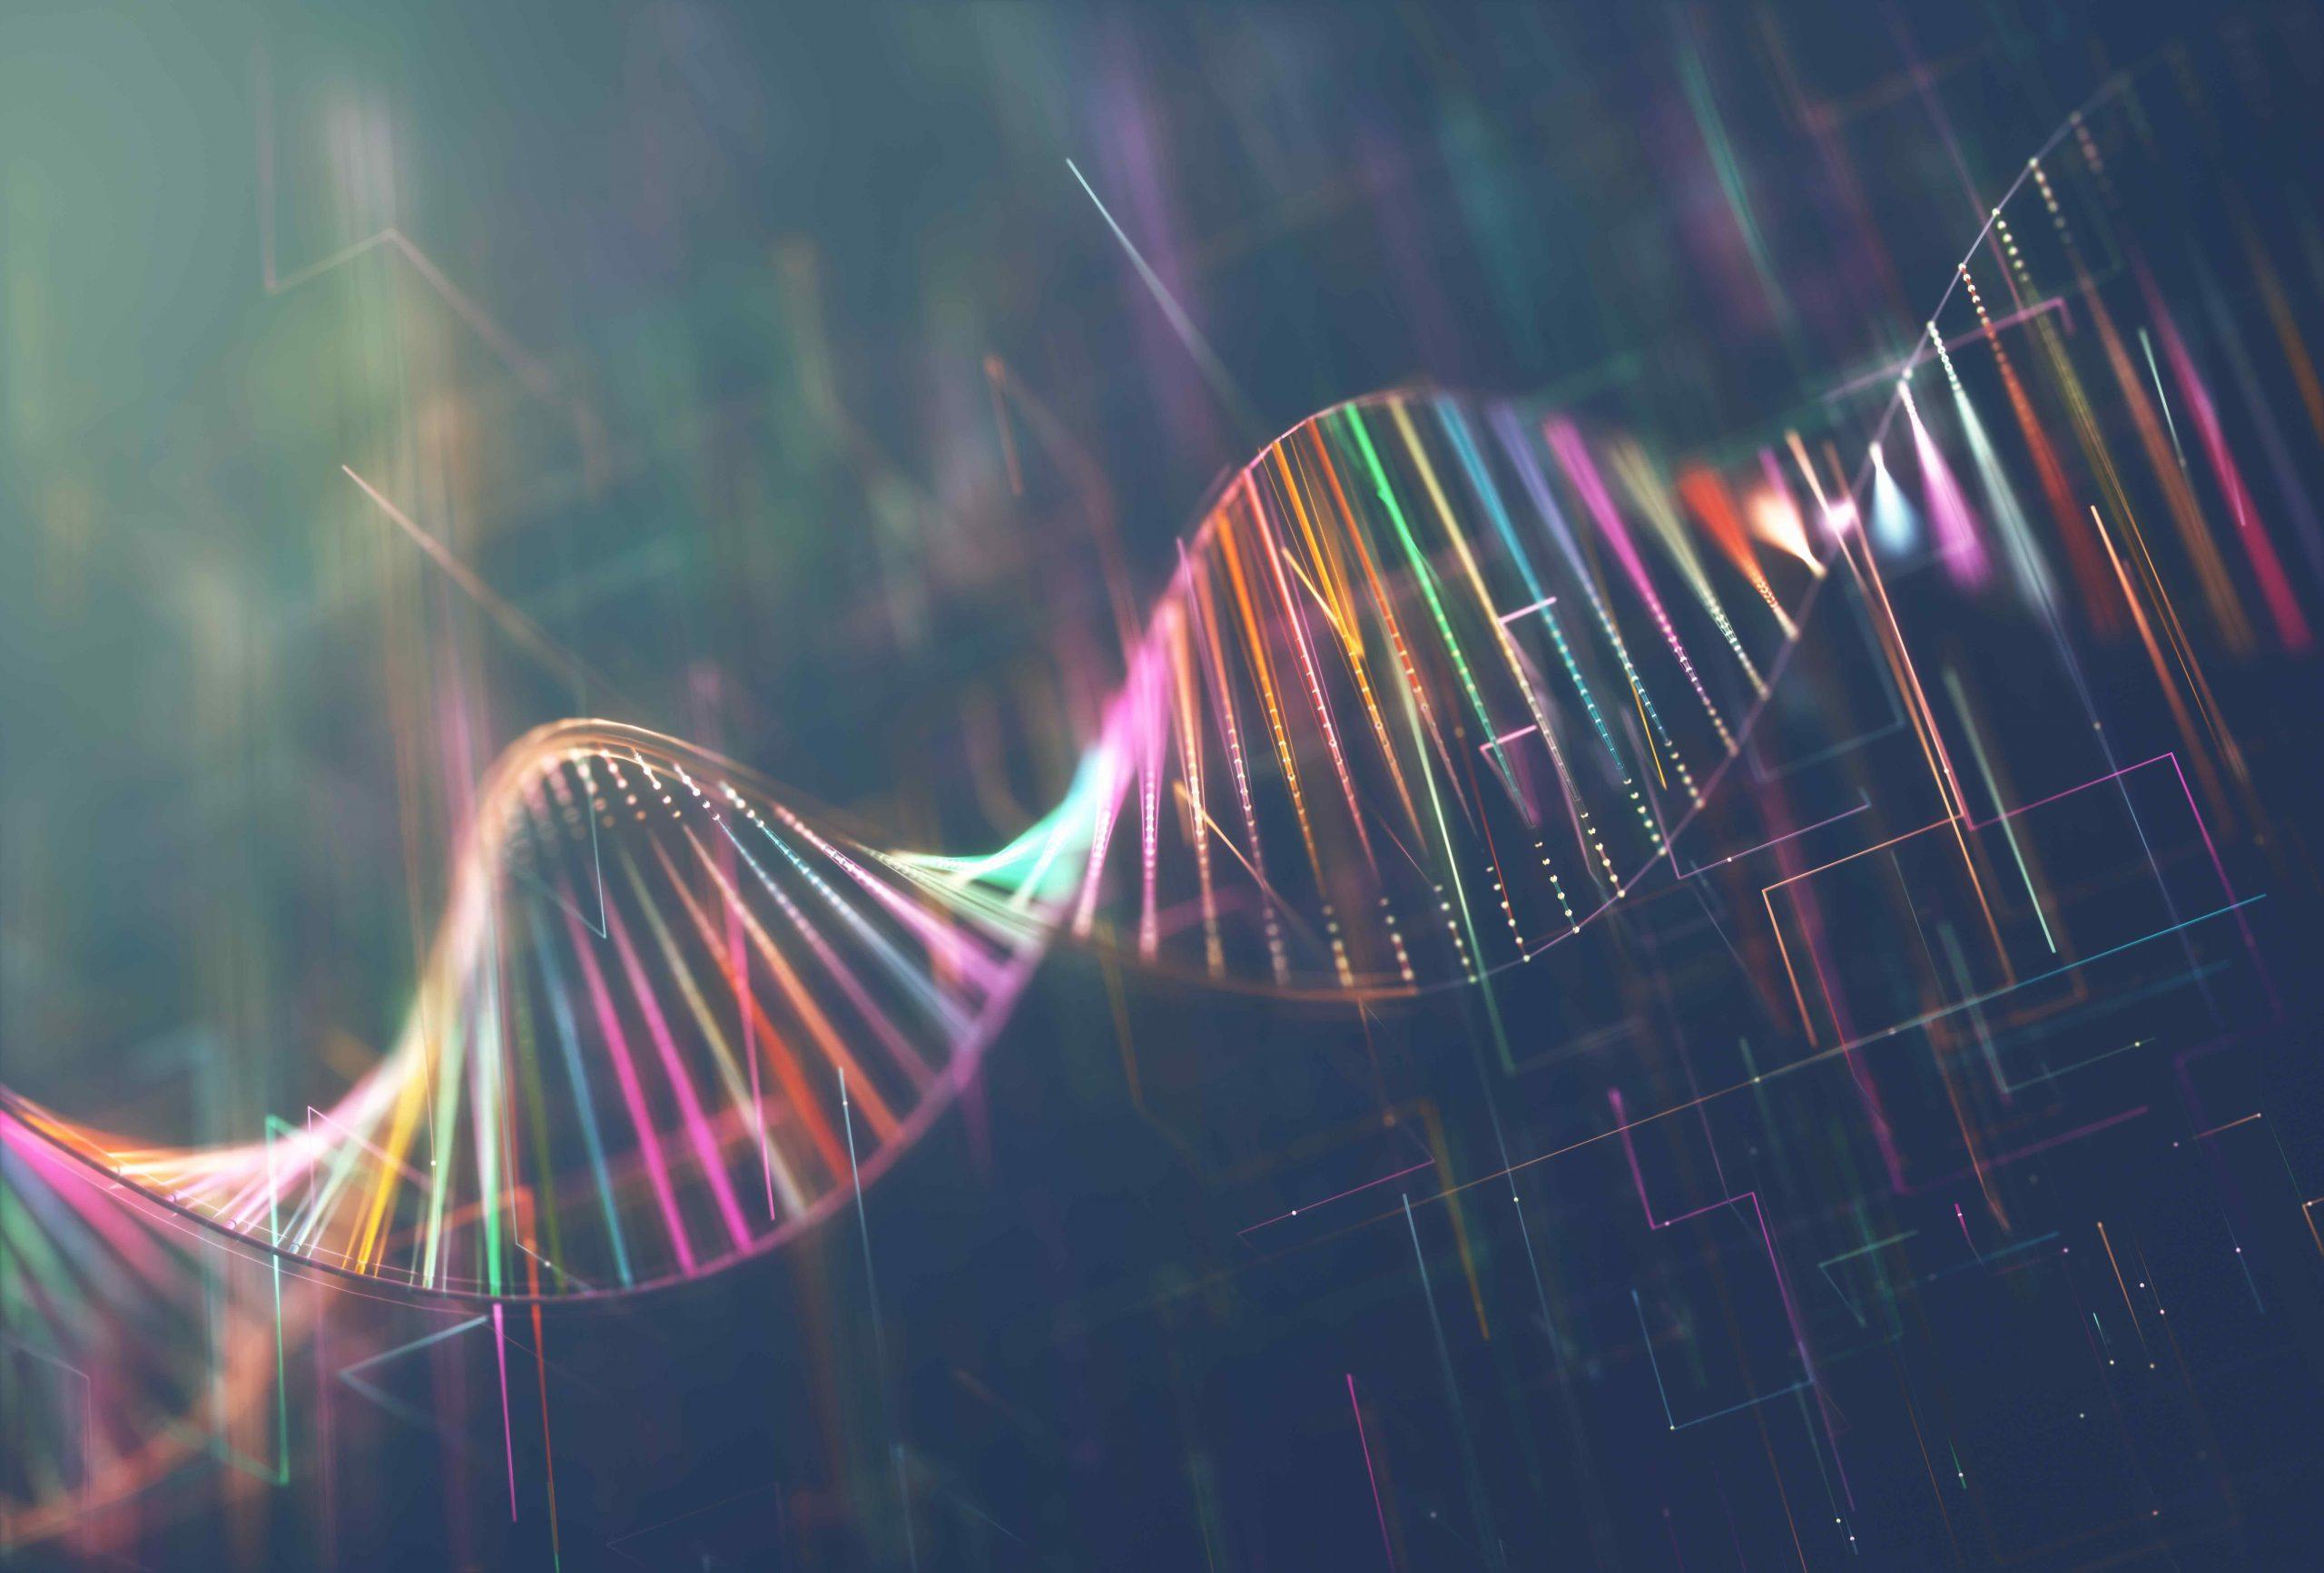 TBG starts public lecture series on genomics